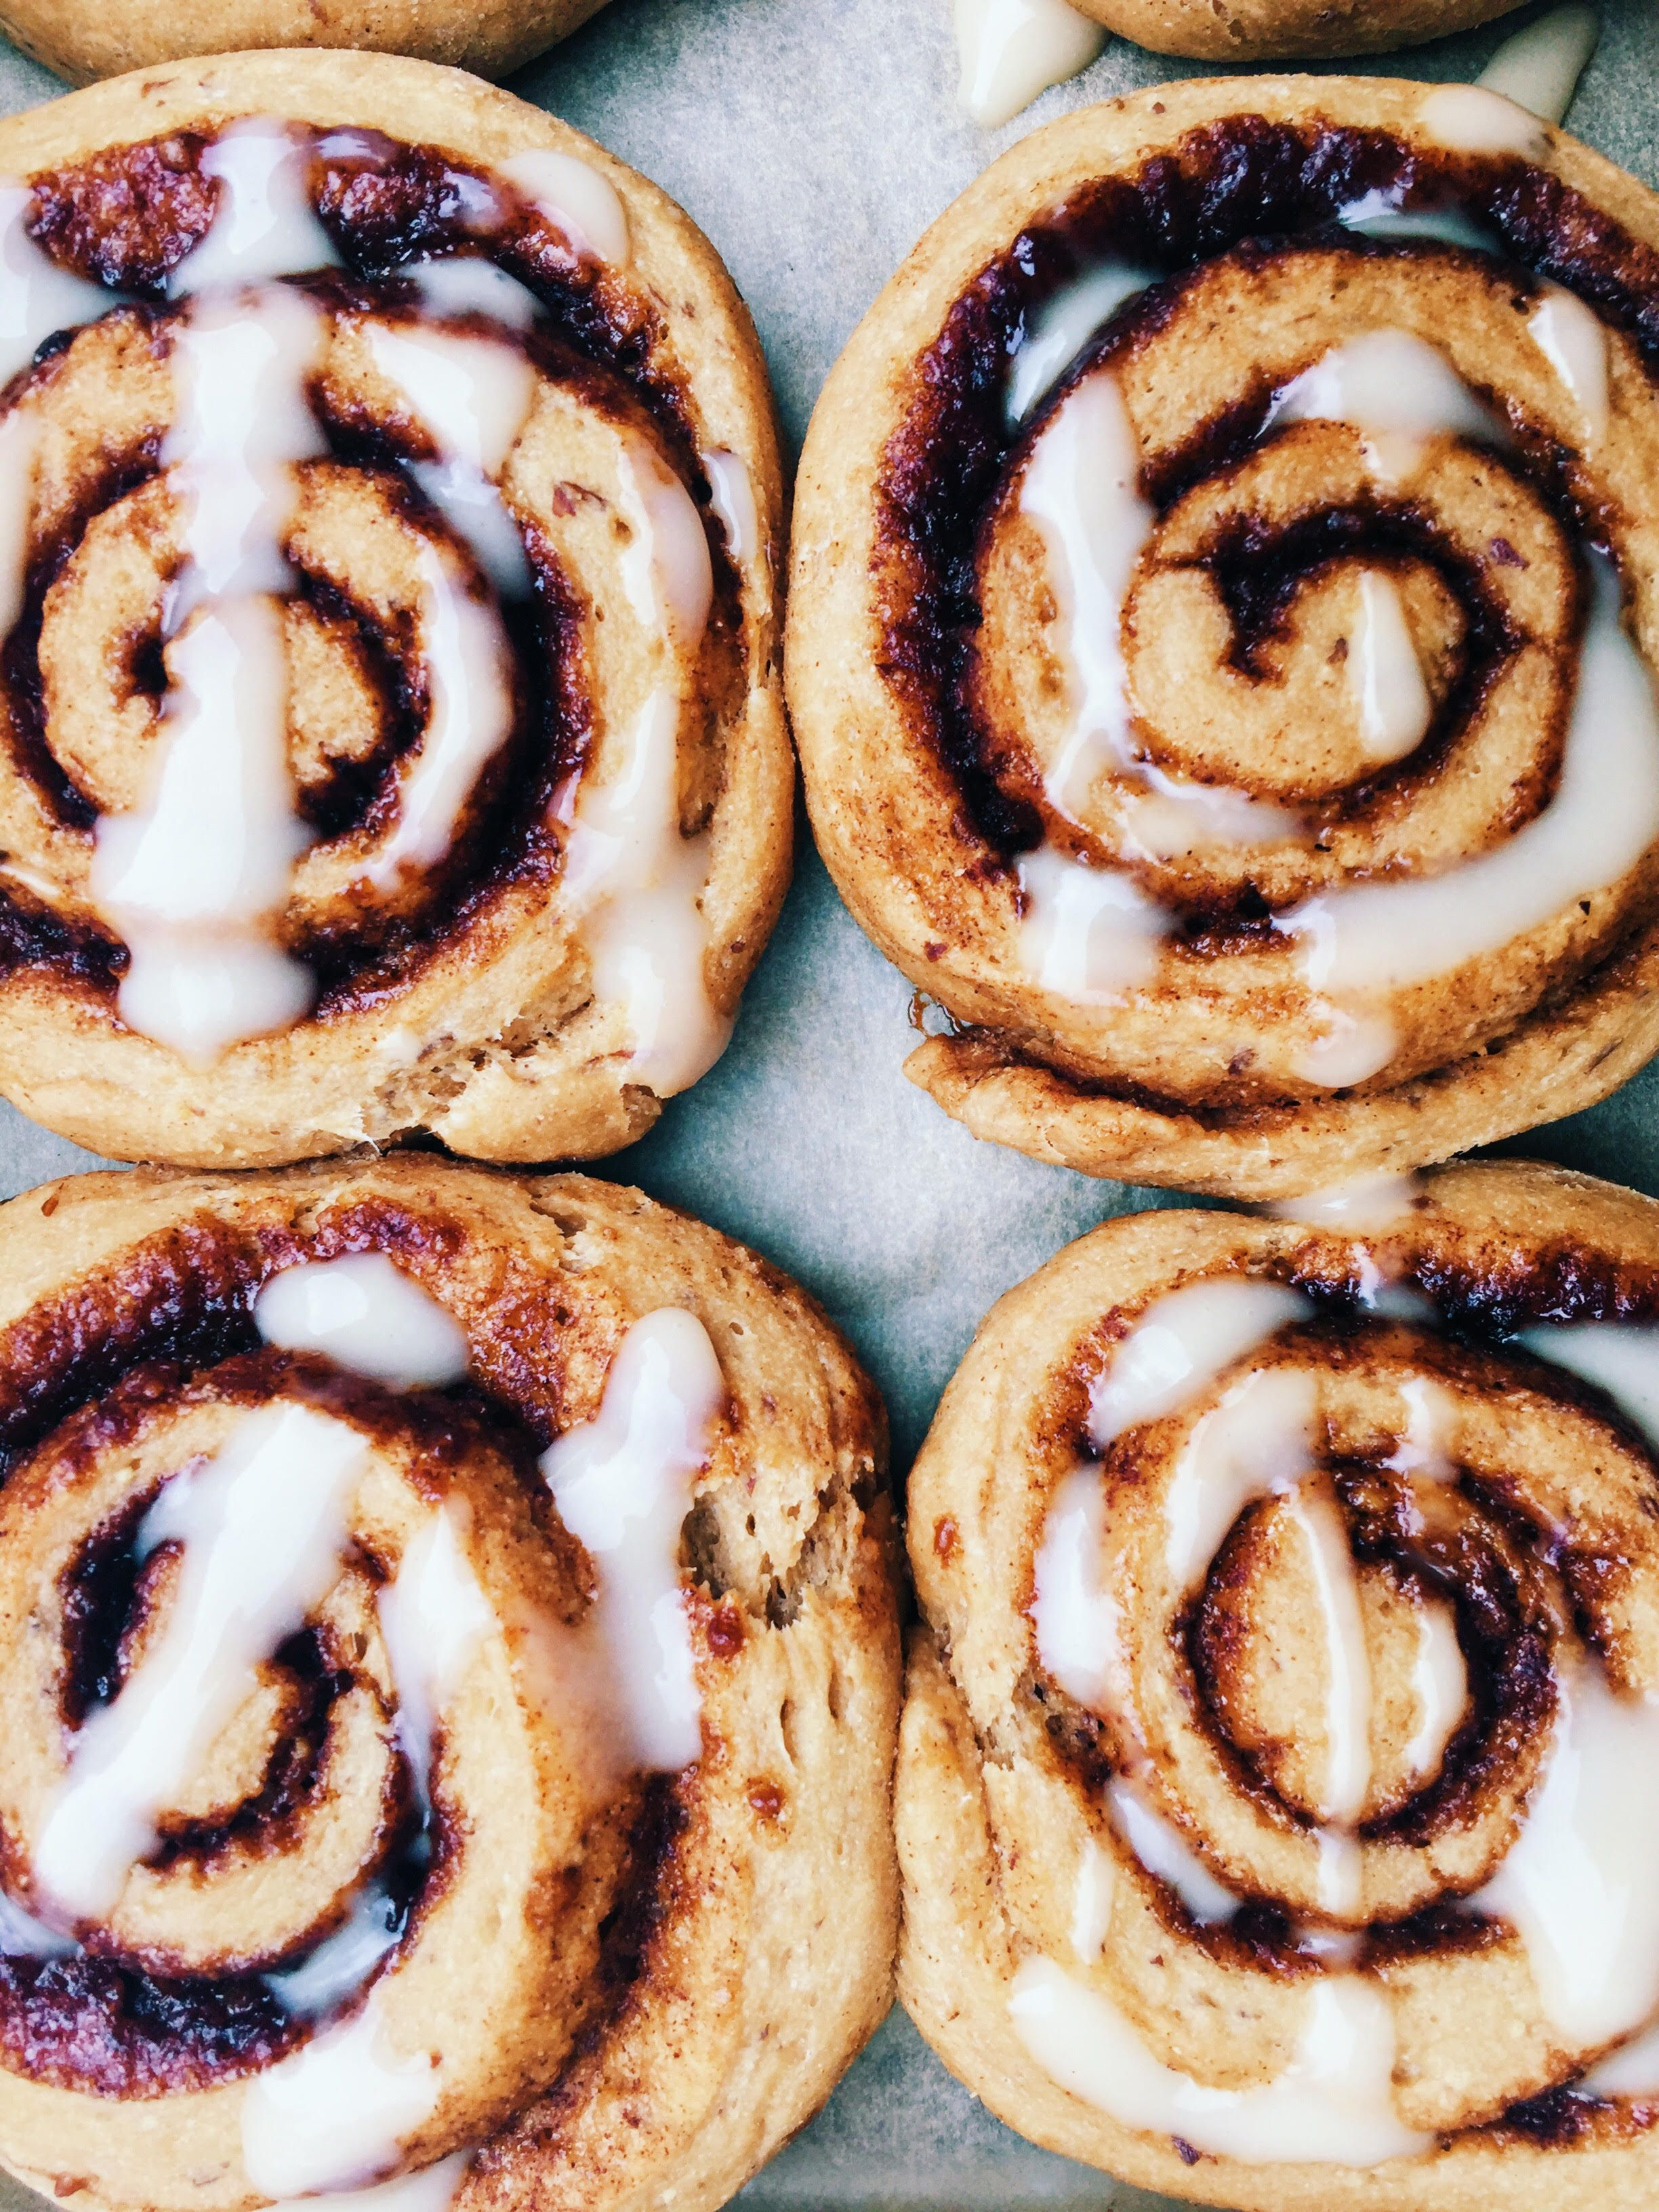 Healthier Whole Wheat Cinnamon Buns With Coconut Butter Icing Vegan Cinnamon Buns Sweet Bread Rolls Vegan Cinnamon Rolls